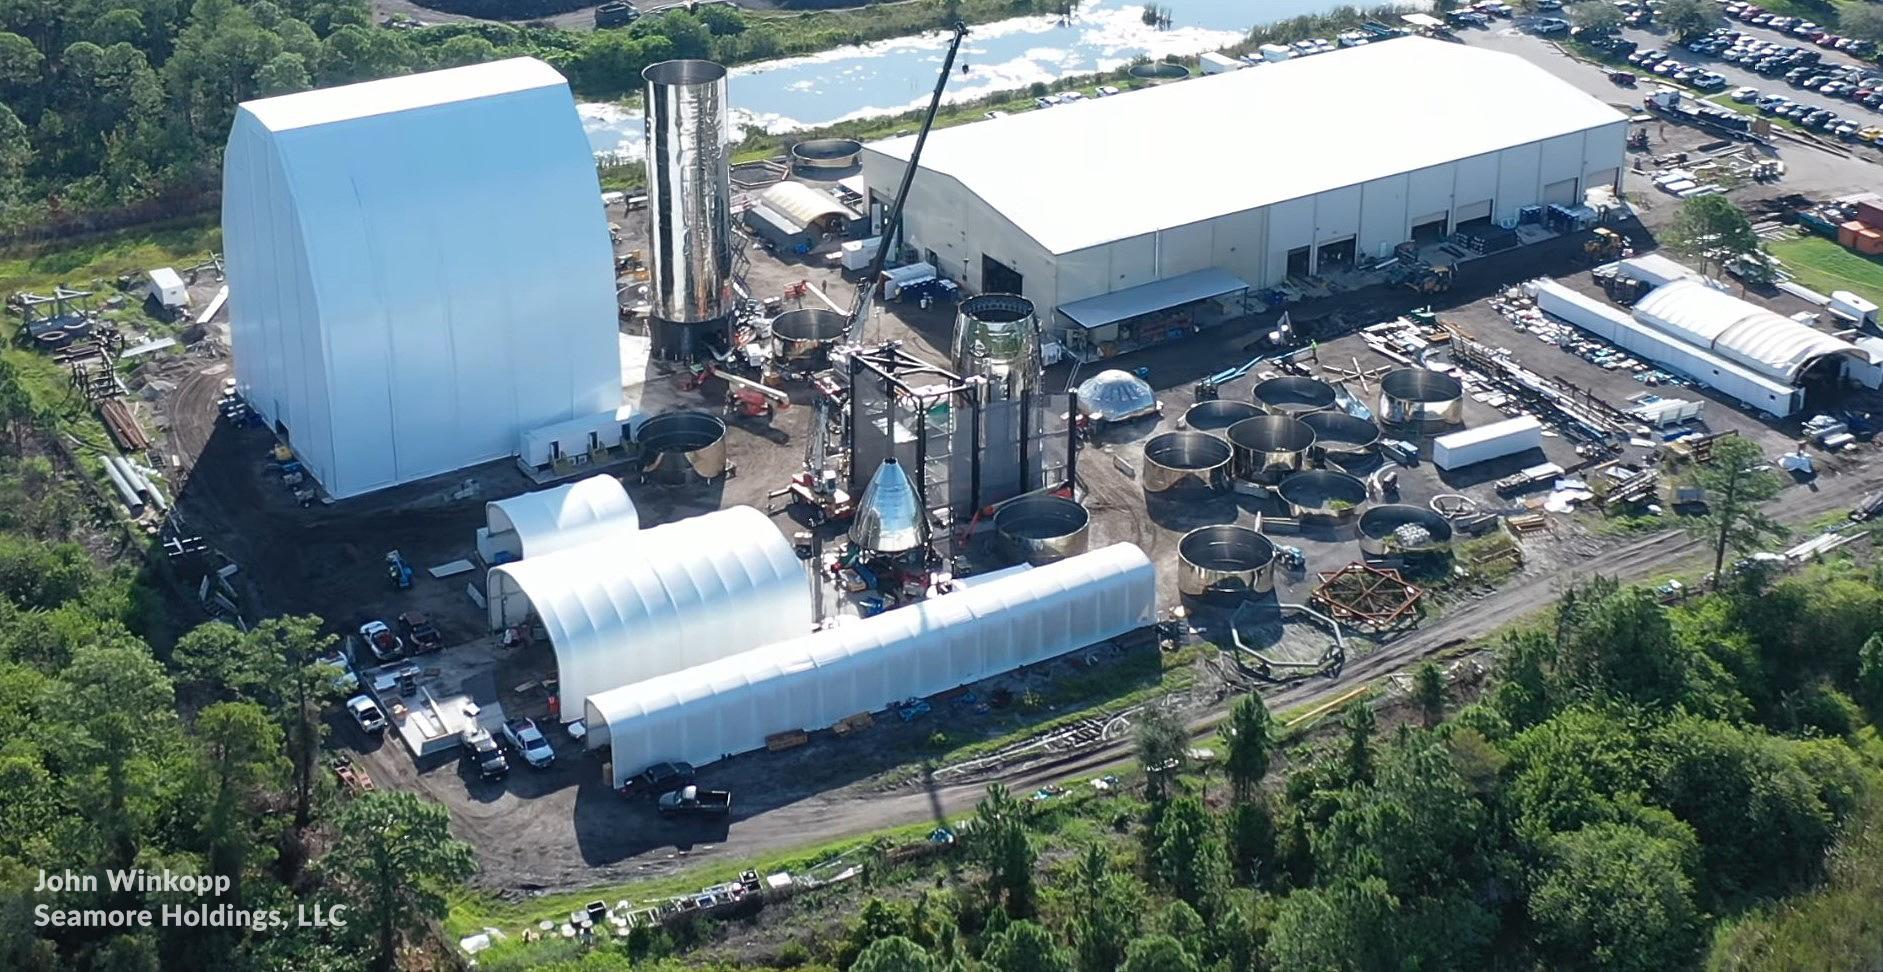 SpaceX scraps Florida Starship Mk2 prototype